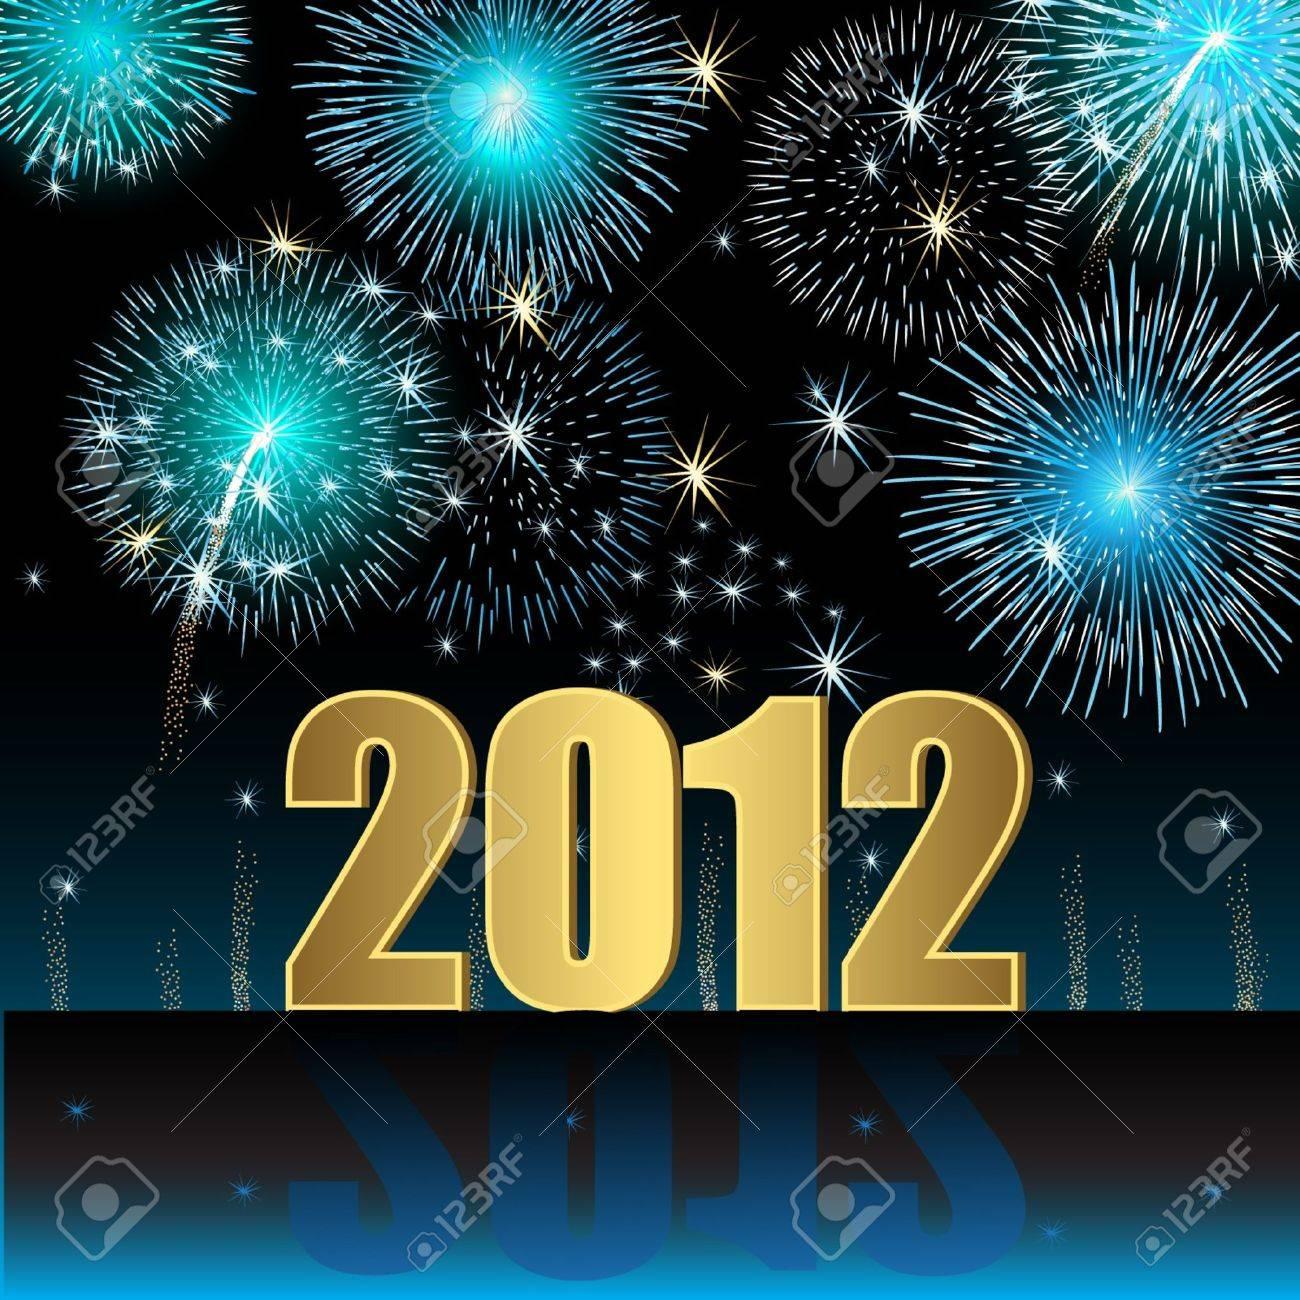 Happy New Year 2012 Stock Vector - 10229341